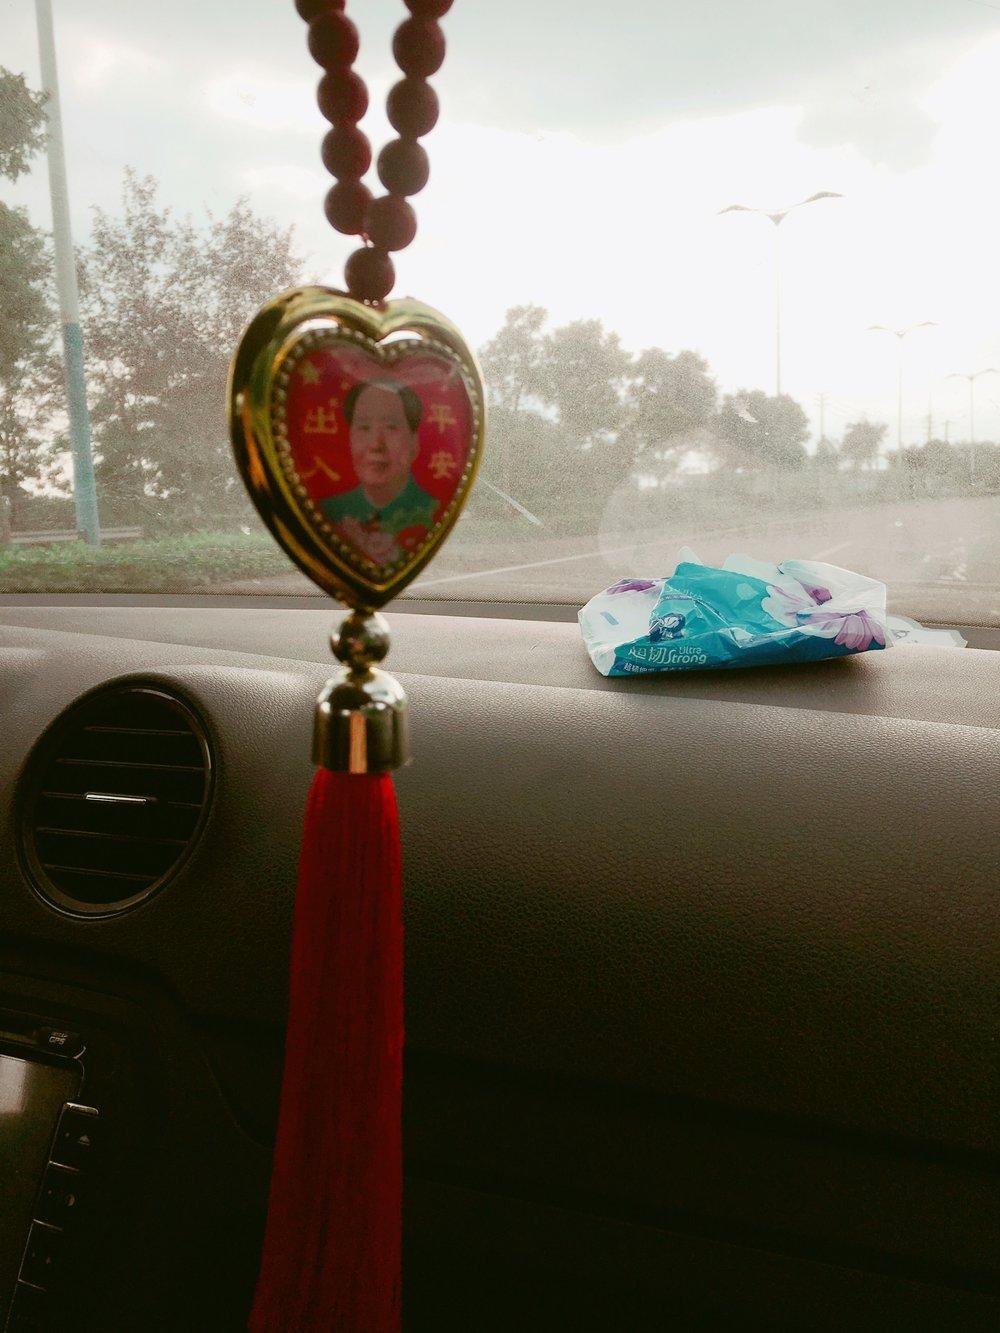 Inside Chen's car